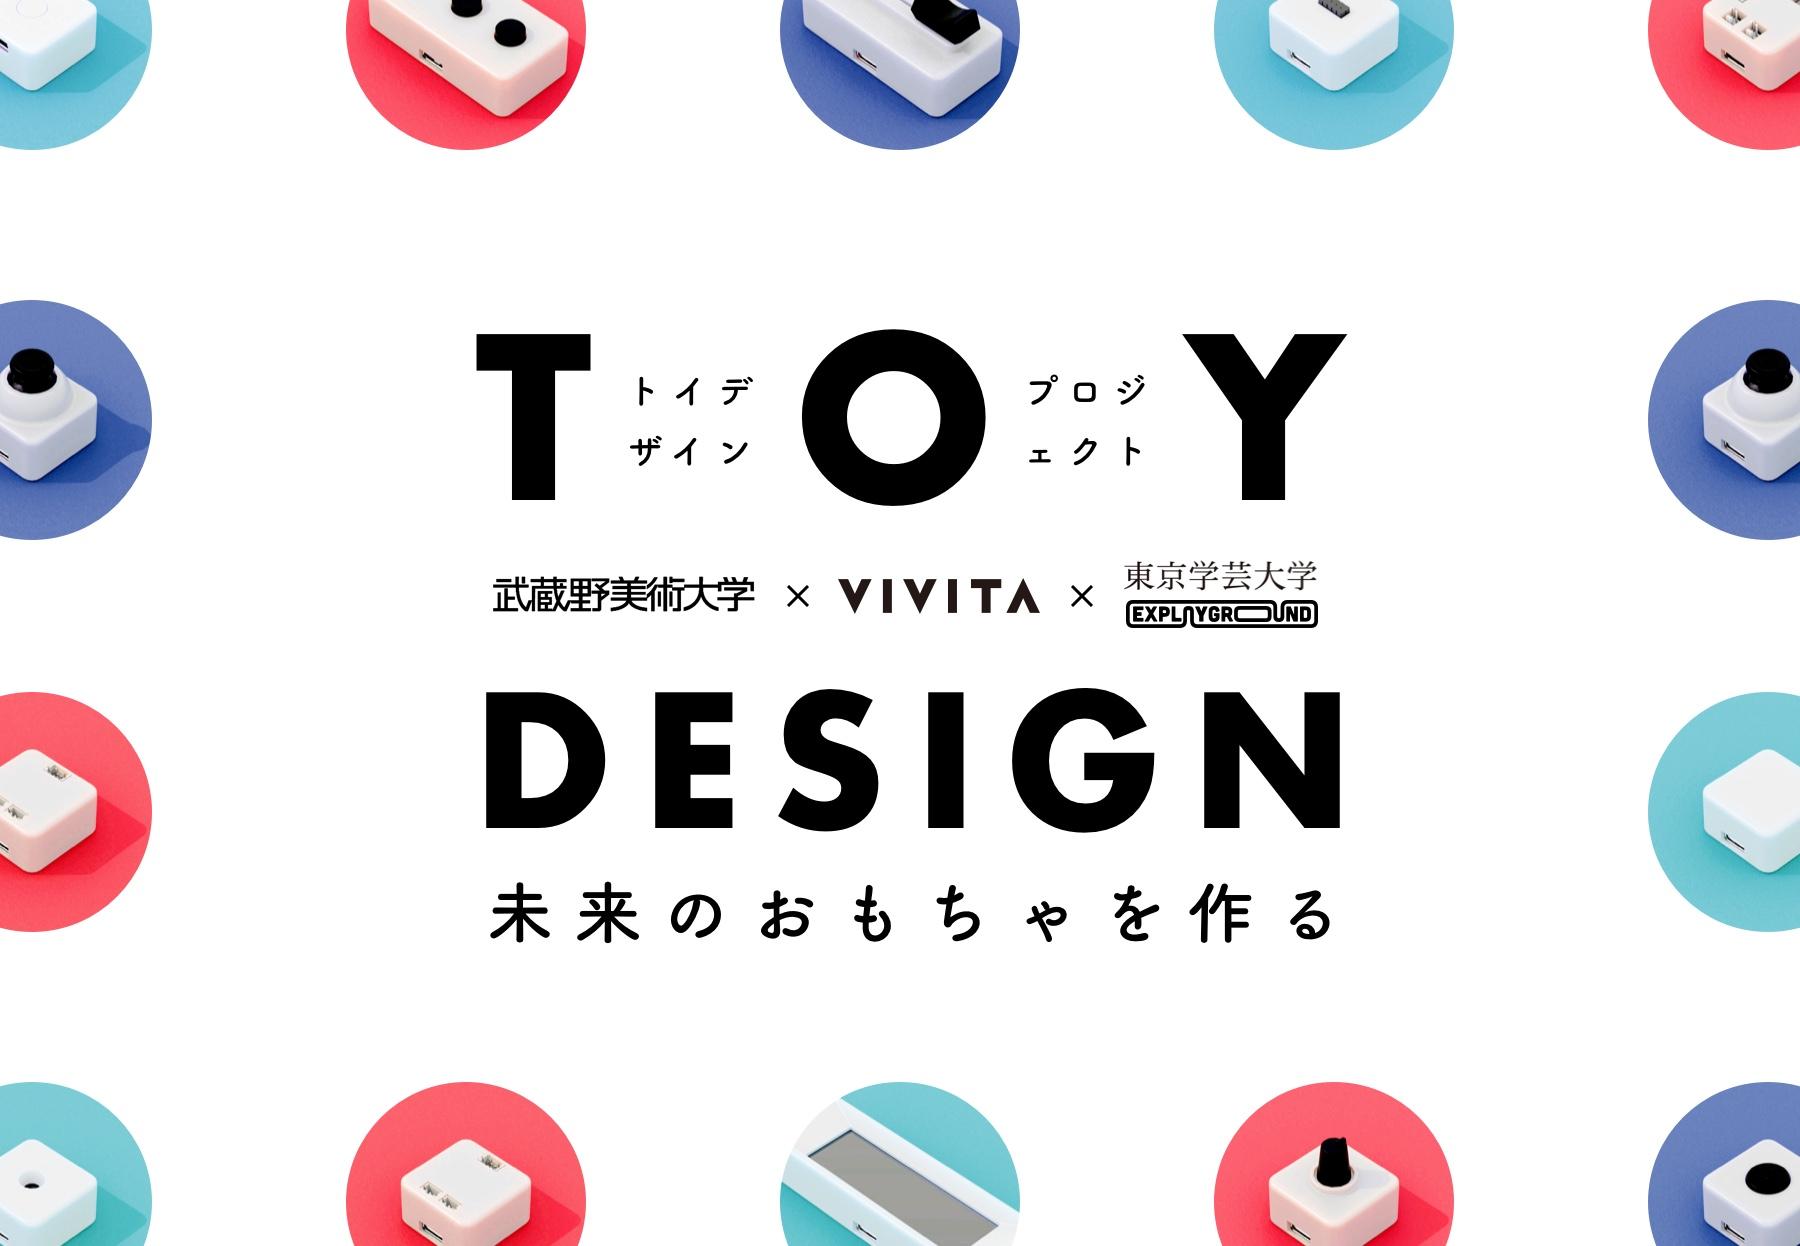 TOY DESIGN | トイデザイン プロジェクト | 未来のおもちゃを作る | 武蔵野美術大学×VIVITA×東京学芸大学